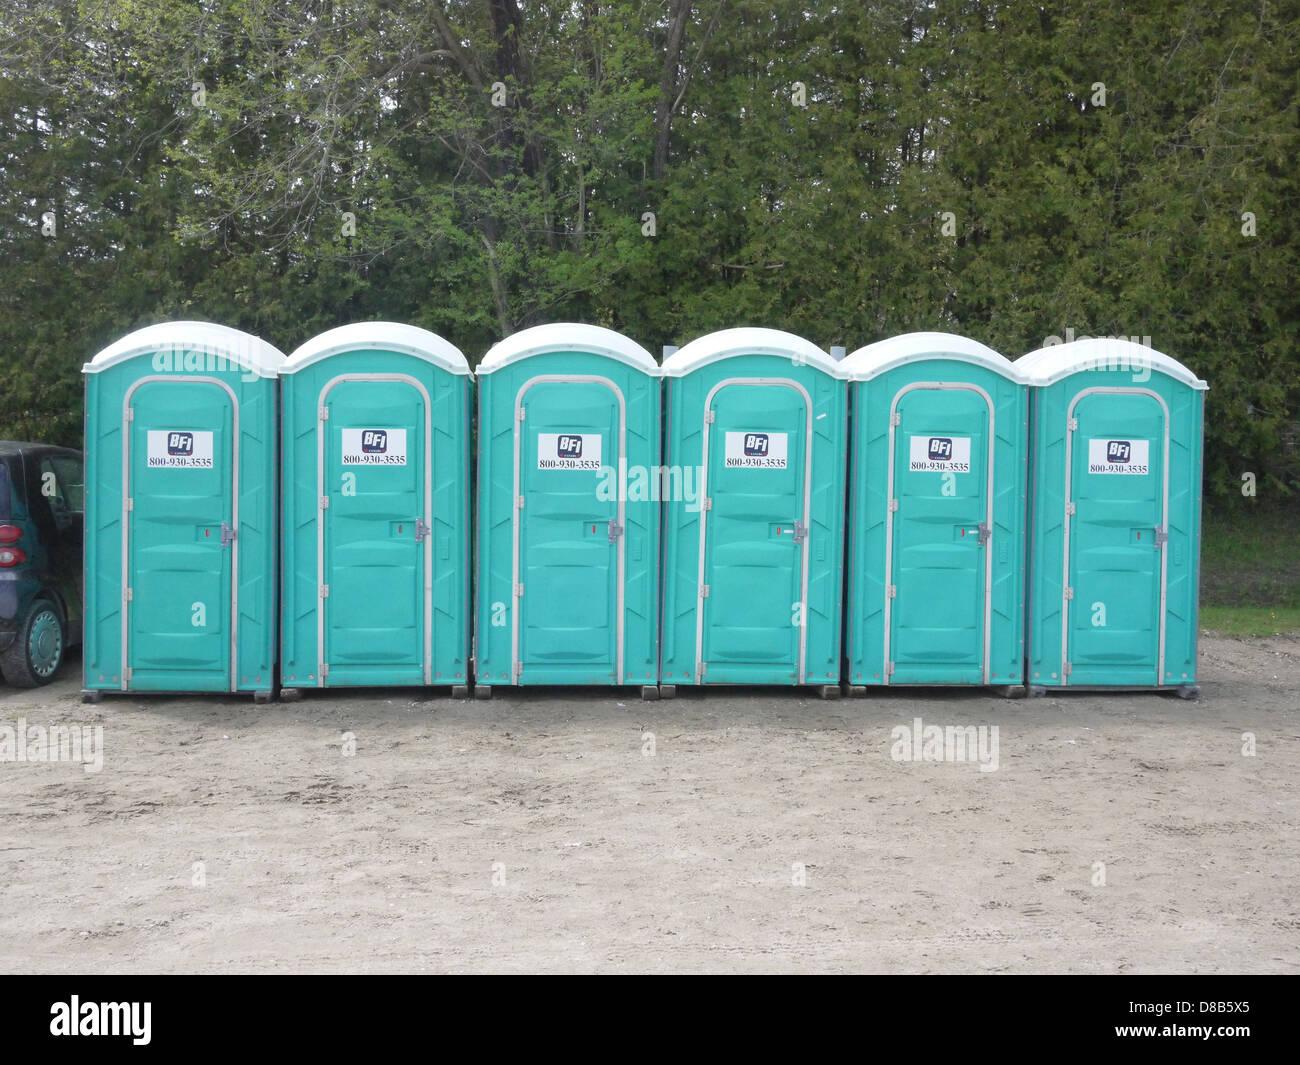 Portable Toilets Row Green Outdoor Restroom